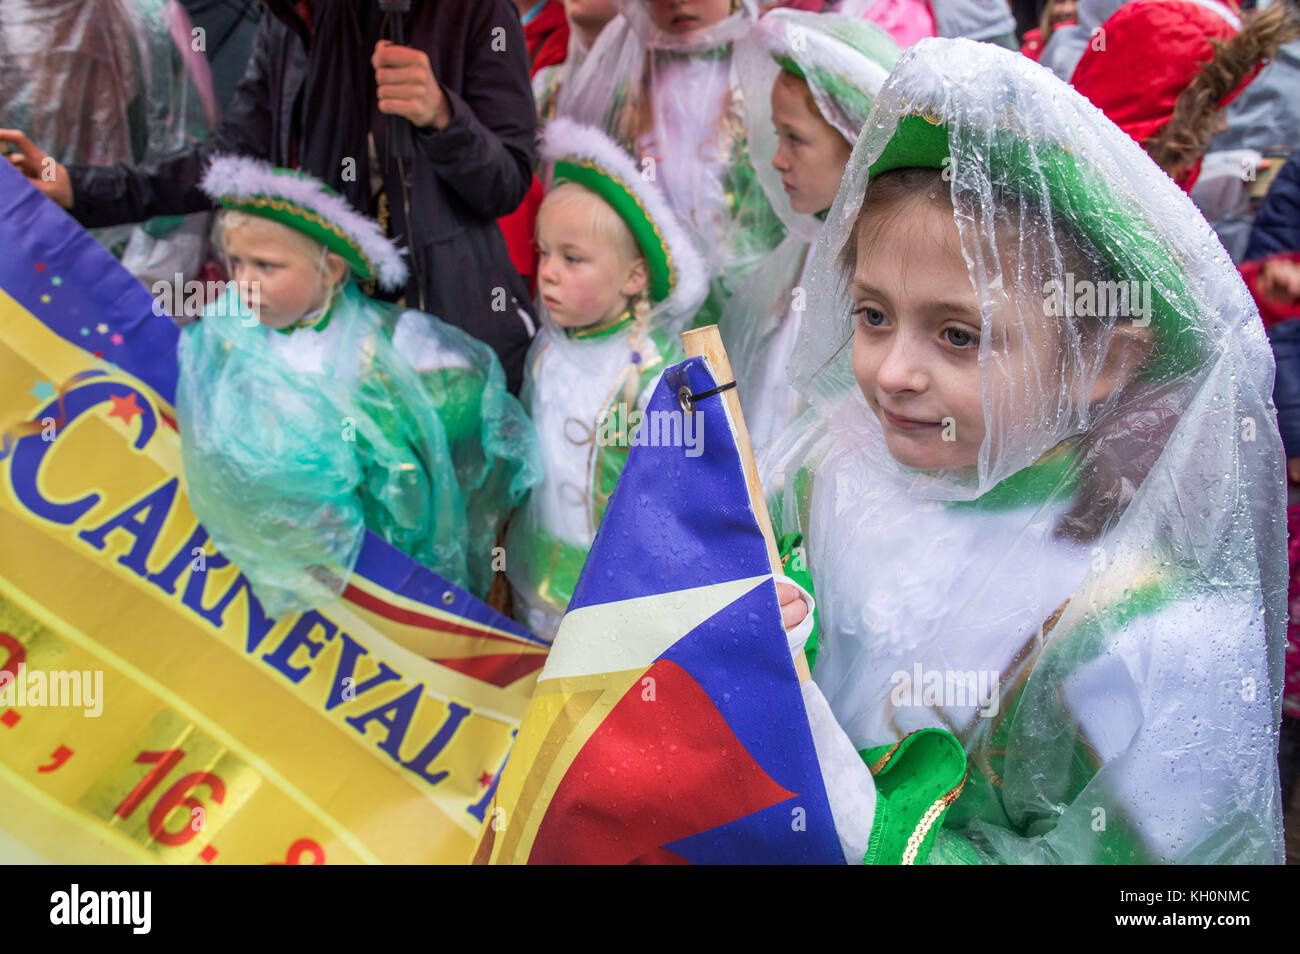 Schwerin, Germany. 11th Nov, 2017. Small Funkenmariechen from the Muhlen-Eichsen Carnival Association wearing ponchos - Stock Image